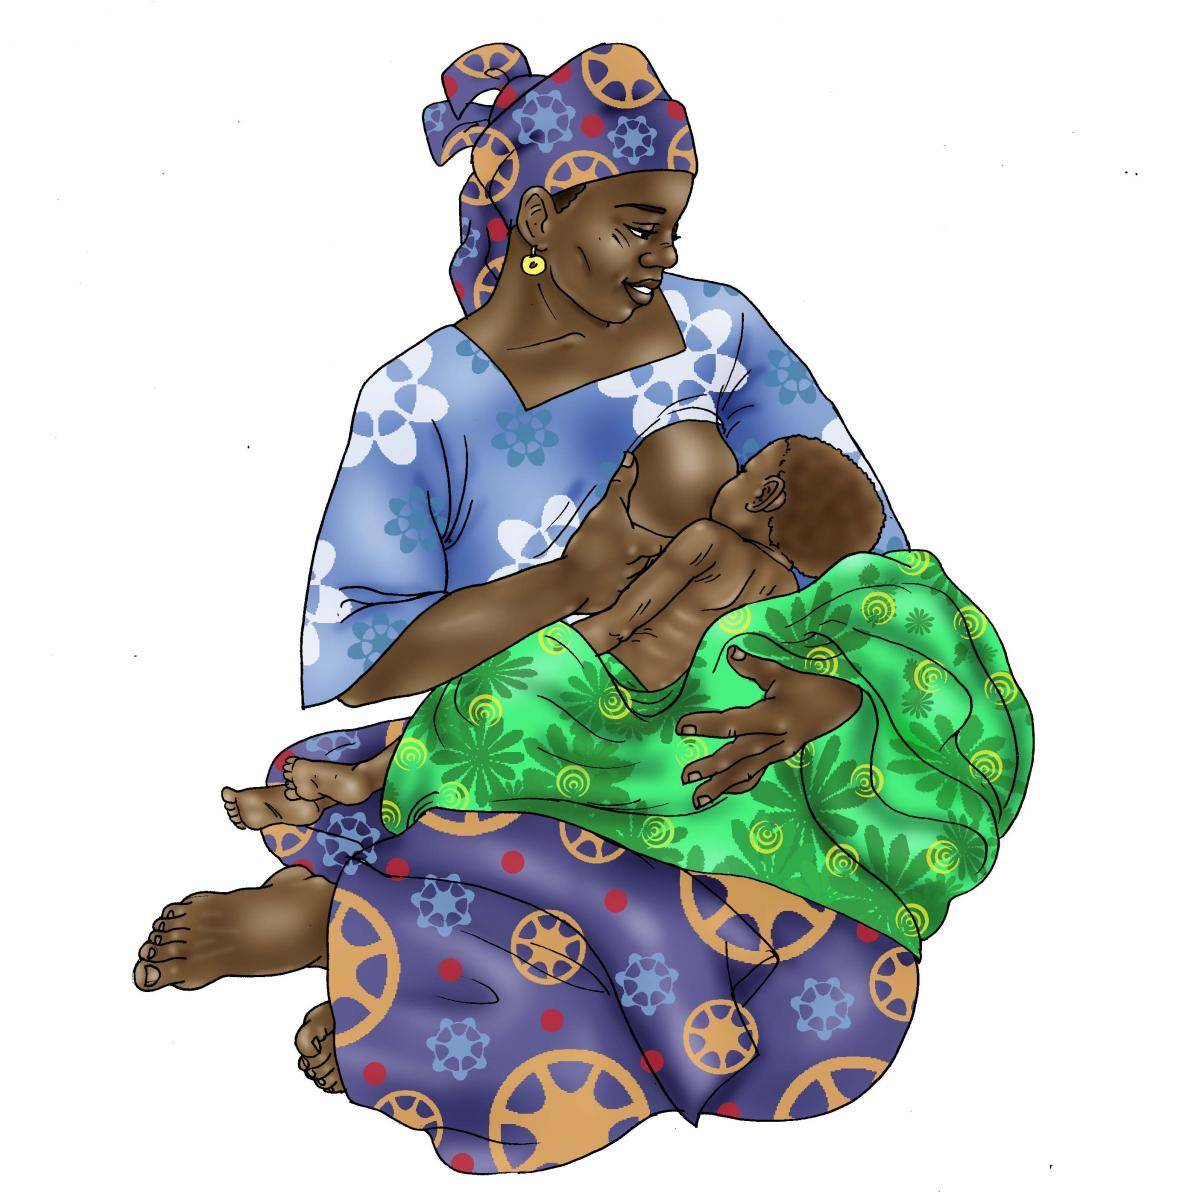 Sick Baby Nutrition - Mother breastfeeding sick baby 0-24 mo - 03 - Niger